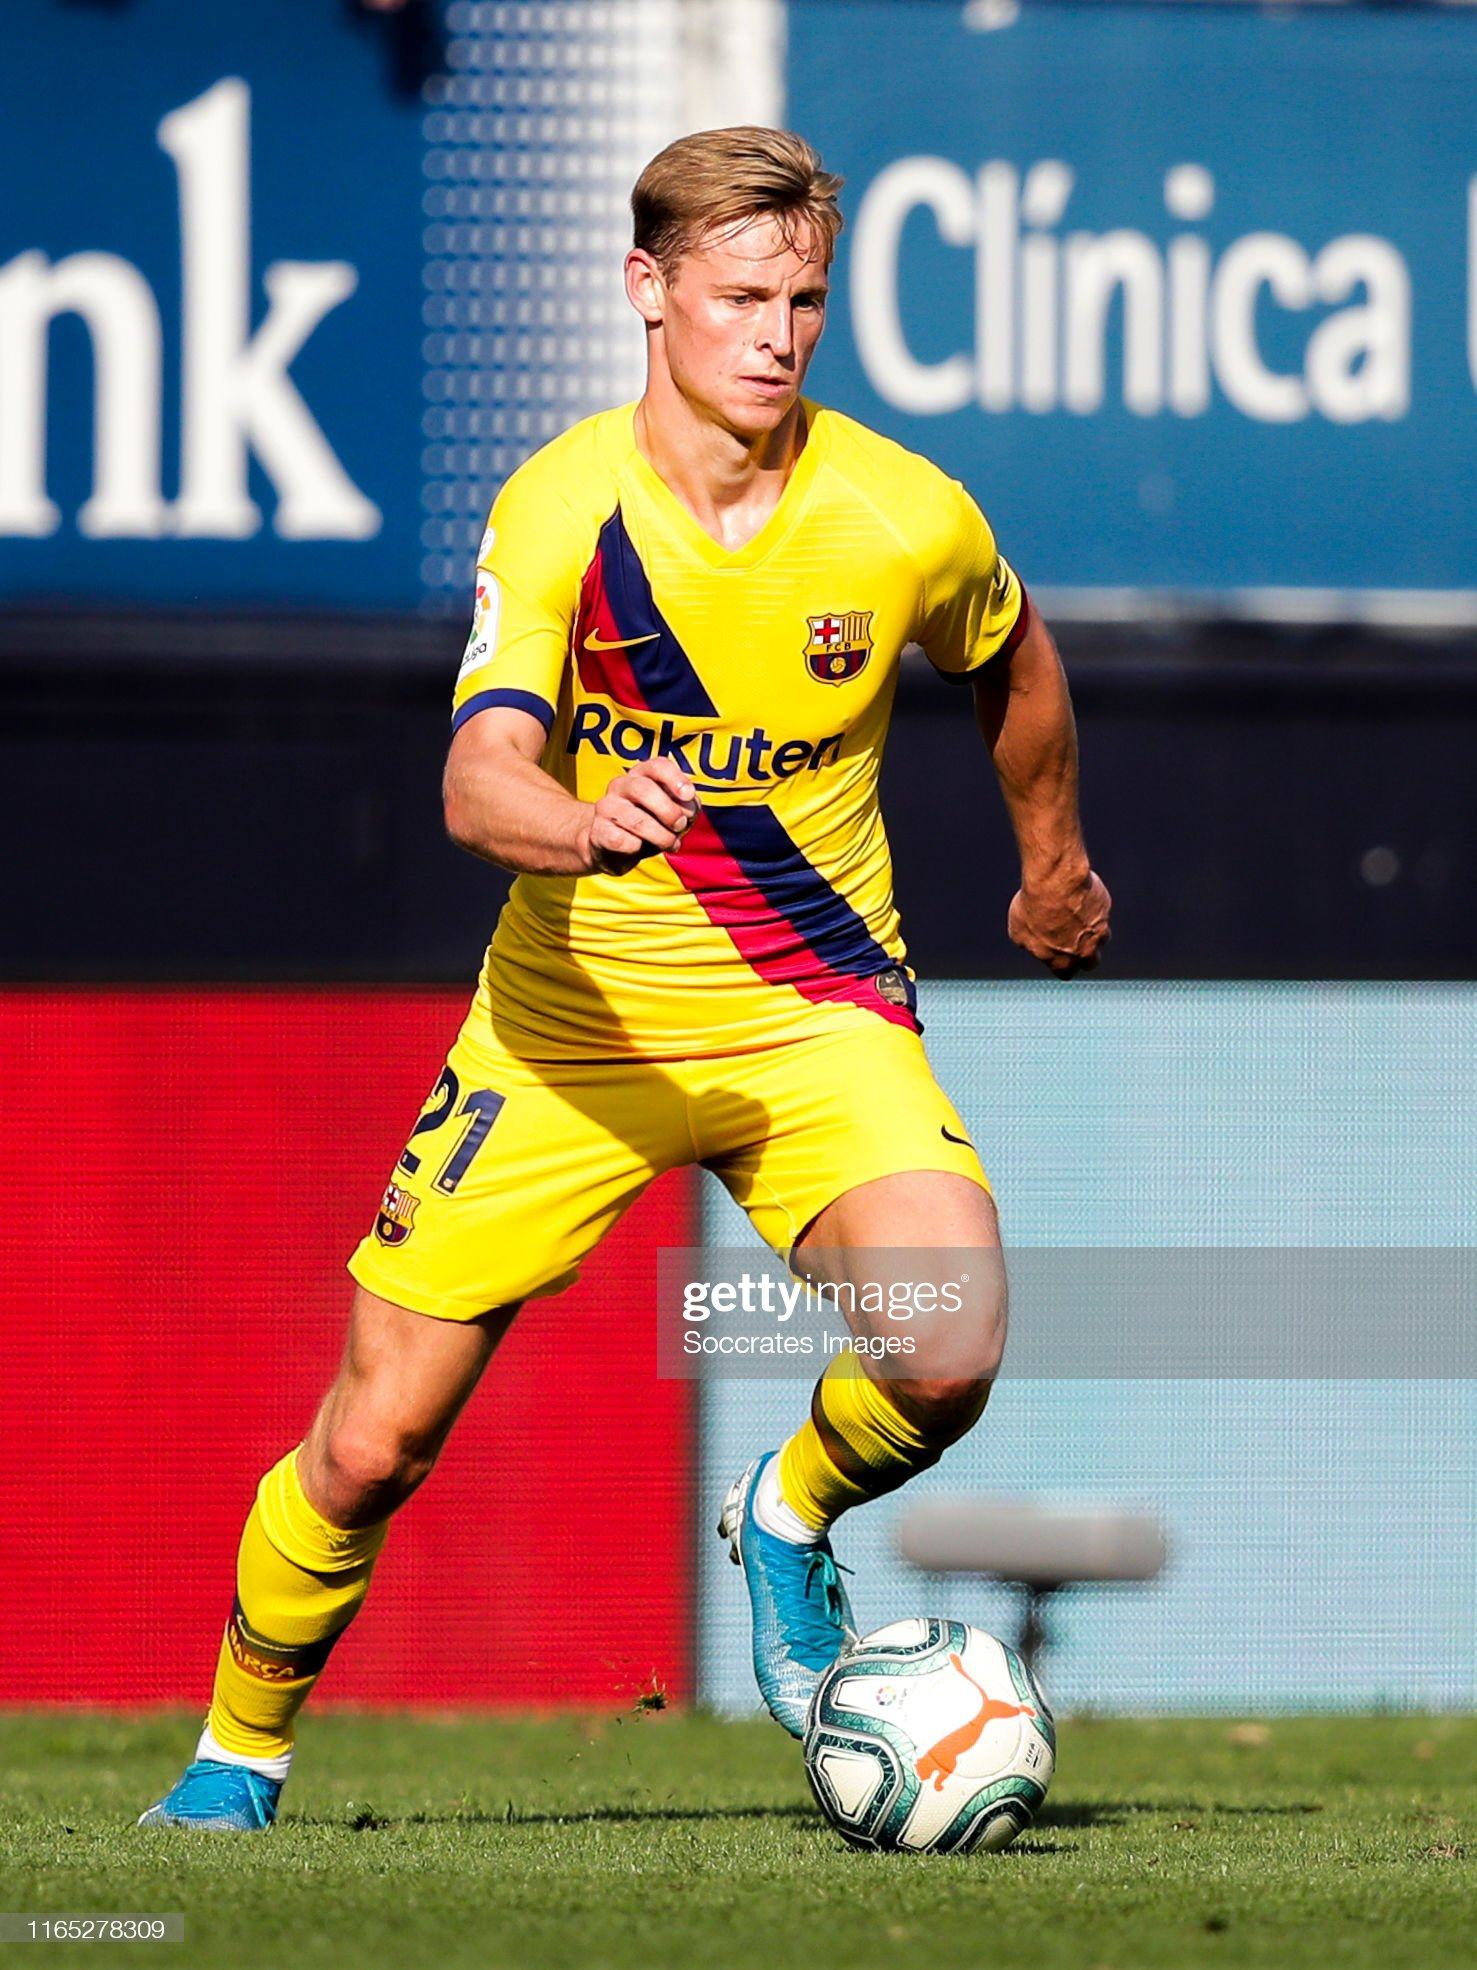 صور مباراة : أوساسونا - برشلونة 2-2 ( 31-08-2019 )  Frenkie-de-jong-of-fc-barcelona-during-the-la-liga-santander-match-picture-id1165278309?s=2048x2048